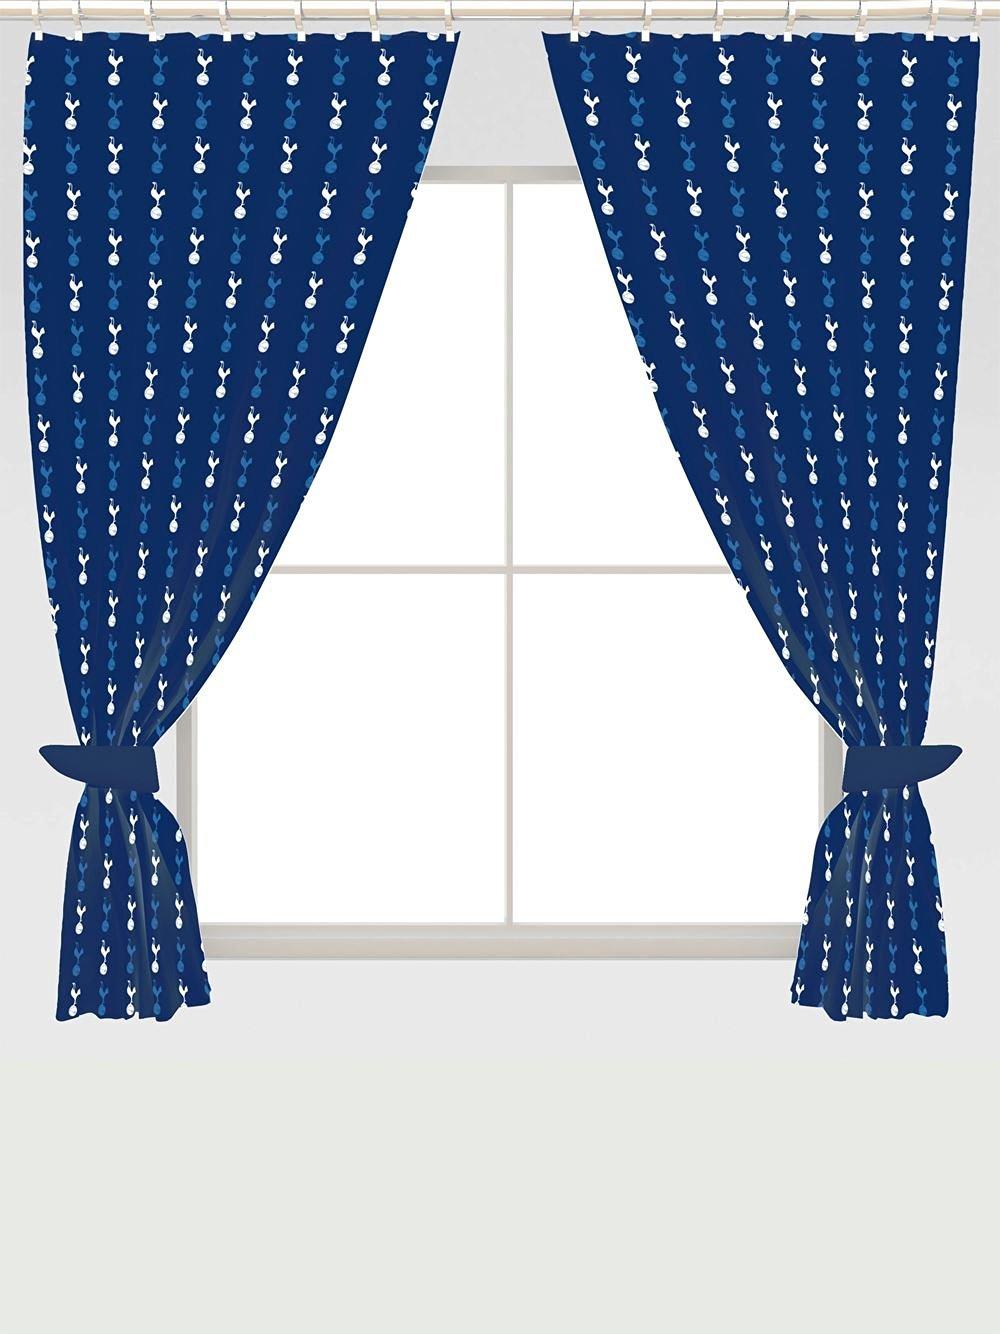 New tottenham hotspur curtains pair 66 x 54 inch boys for Crest home designs curtains